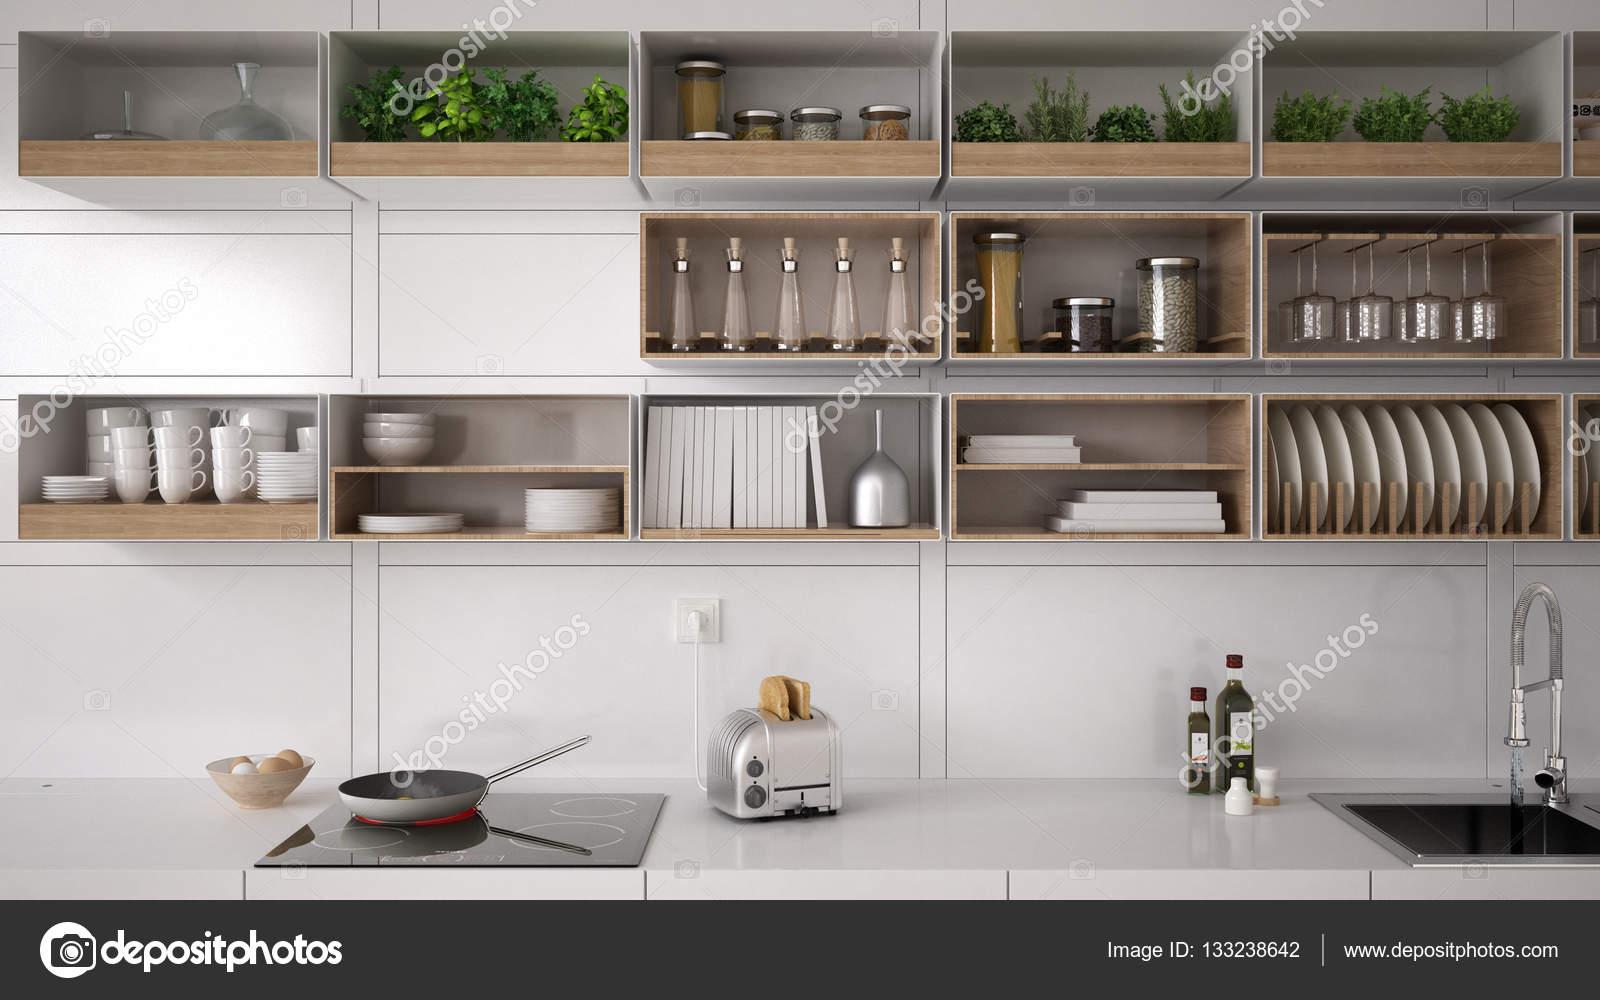 scandinavian white kitchen shelving system minimalistic interi rh depositphotos com ikea kitchen shelving system ikea kitchen shelving system